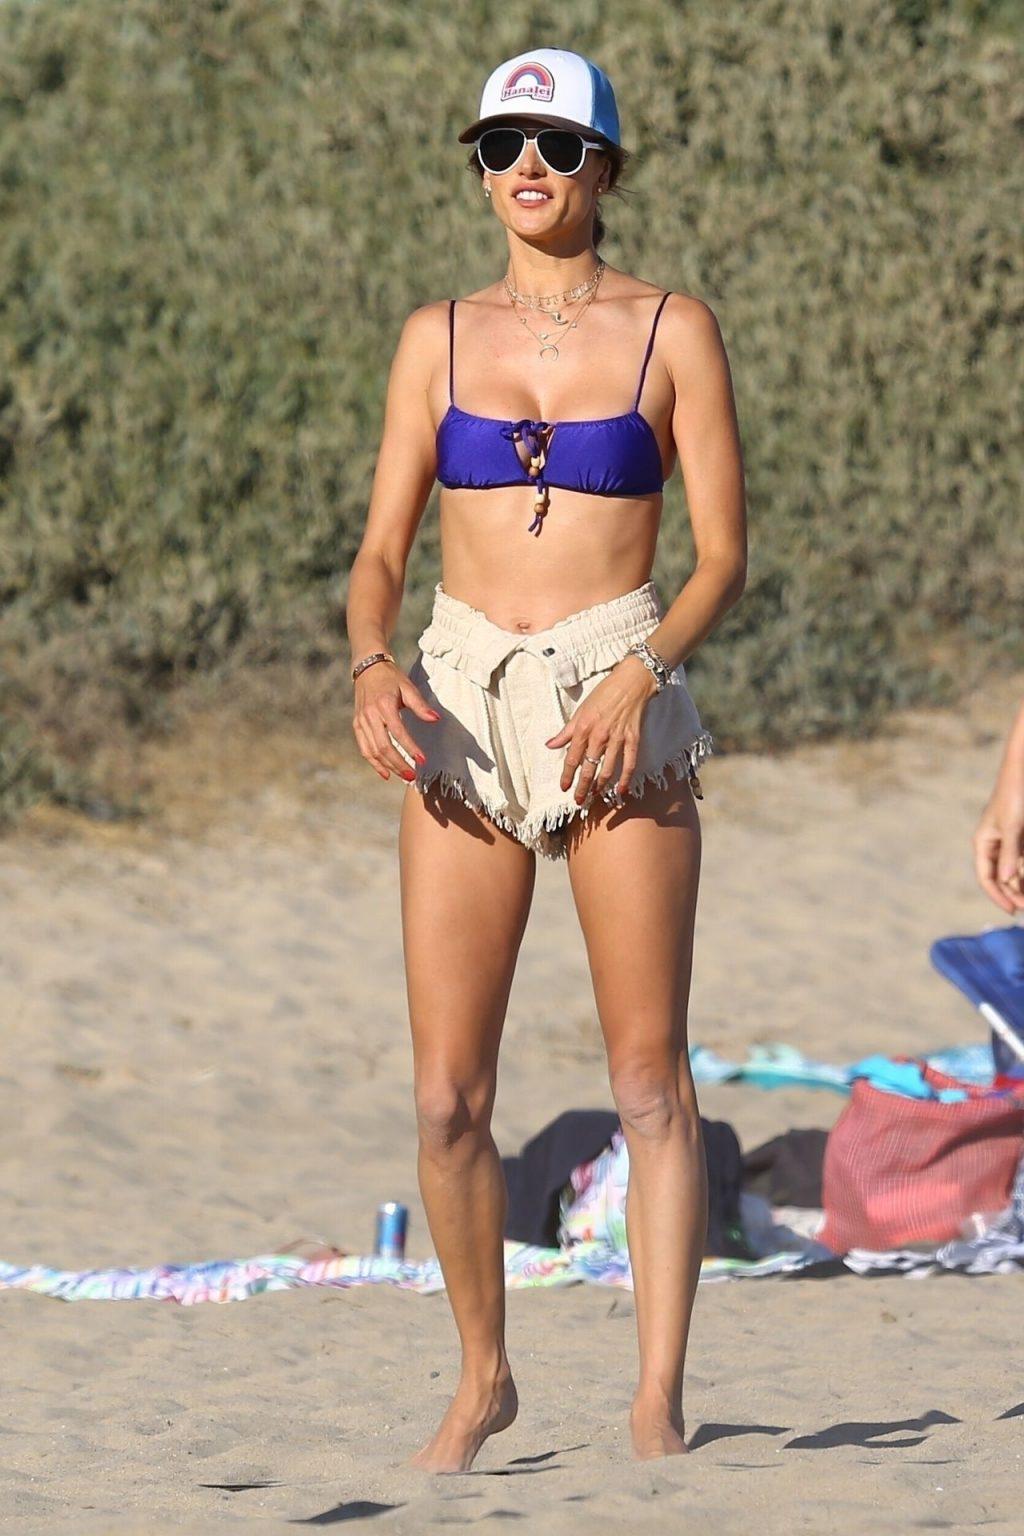 Sexy Alessandra Ambrosio Enjoys Another Day at the Beach (112 Photos)